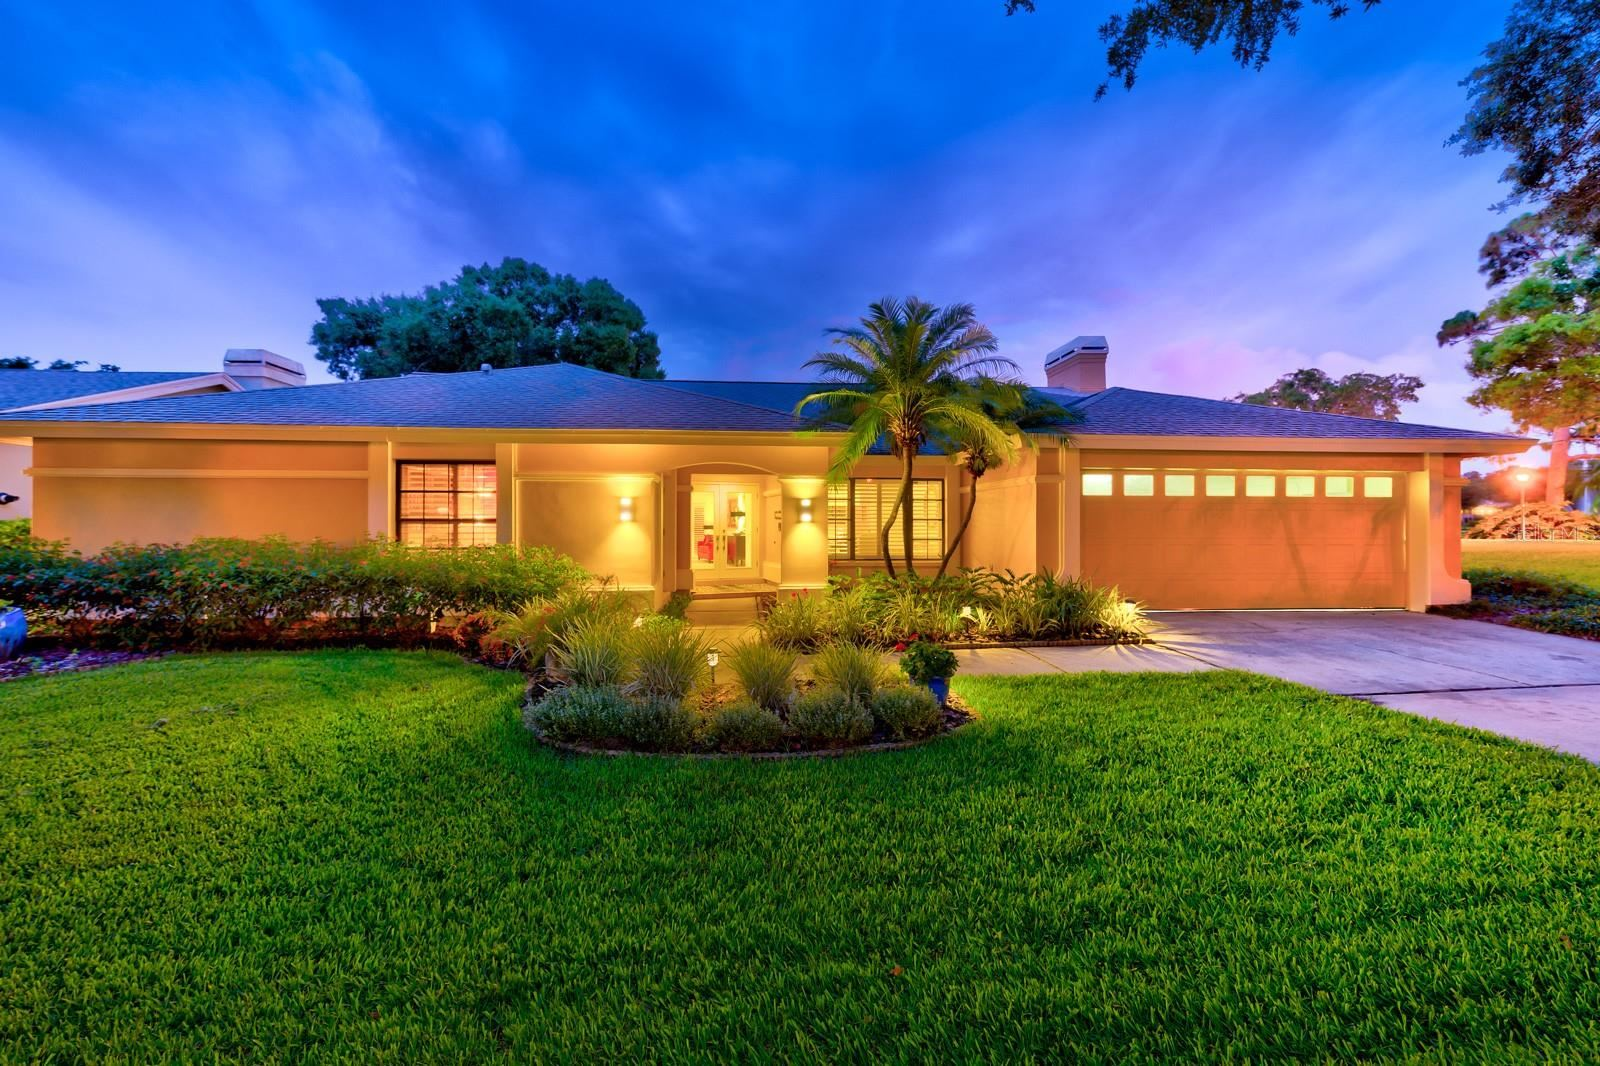 2621 COBBS WAY, Palm Harbor, FL 34684 - #: U8126064